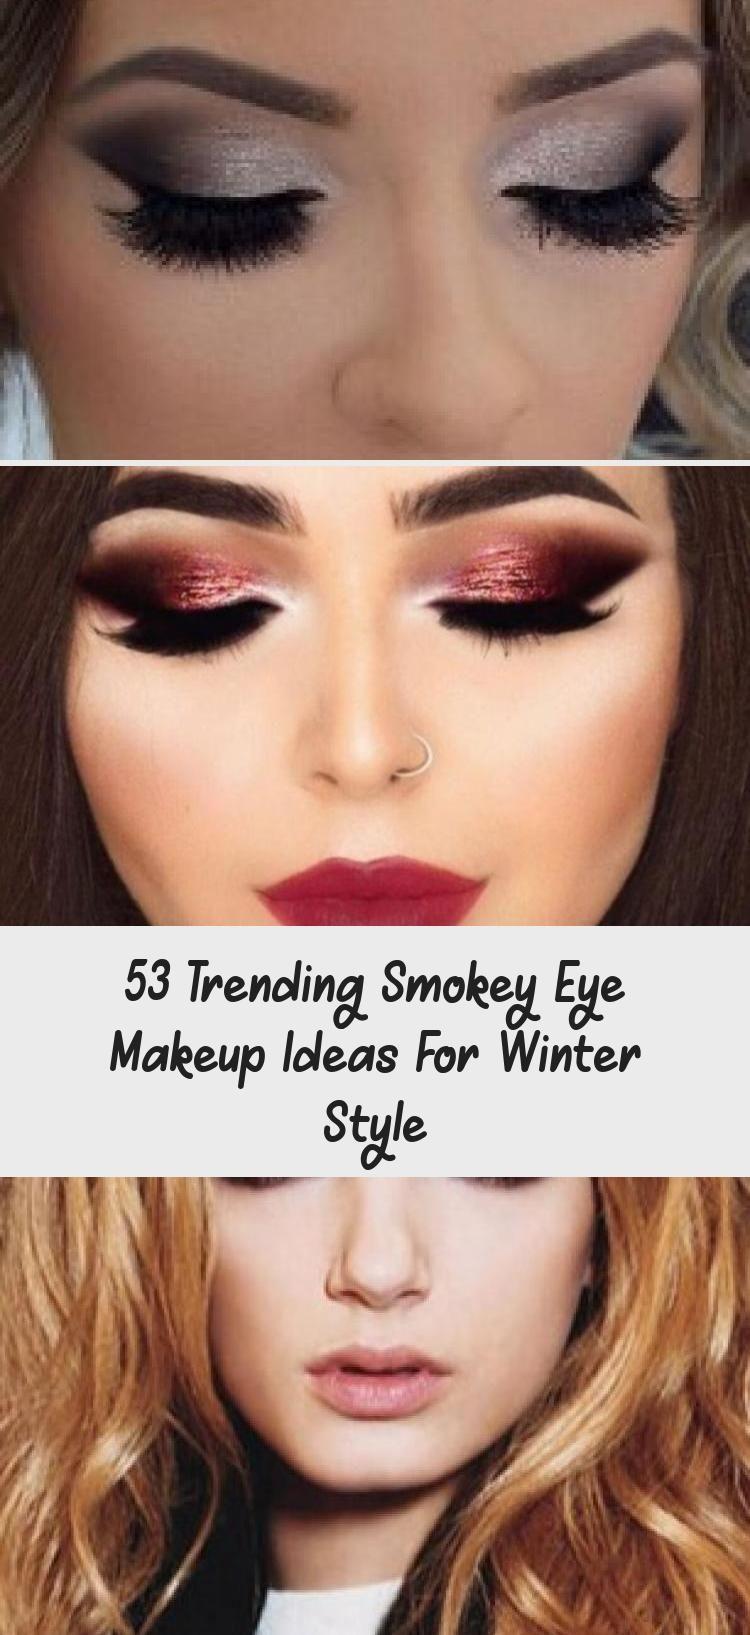 53 Trending Smokey Eye Makeup Ideas For Winter Style Eye Makeup